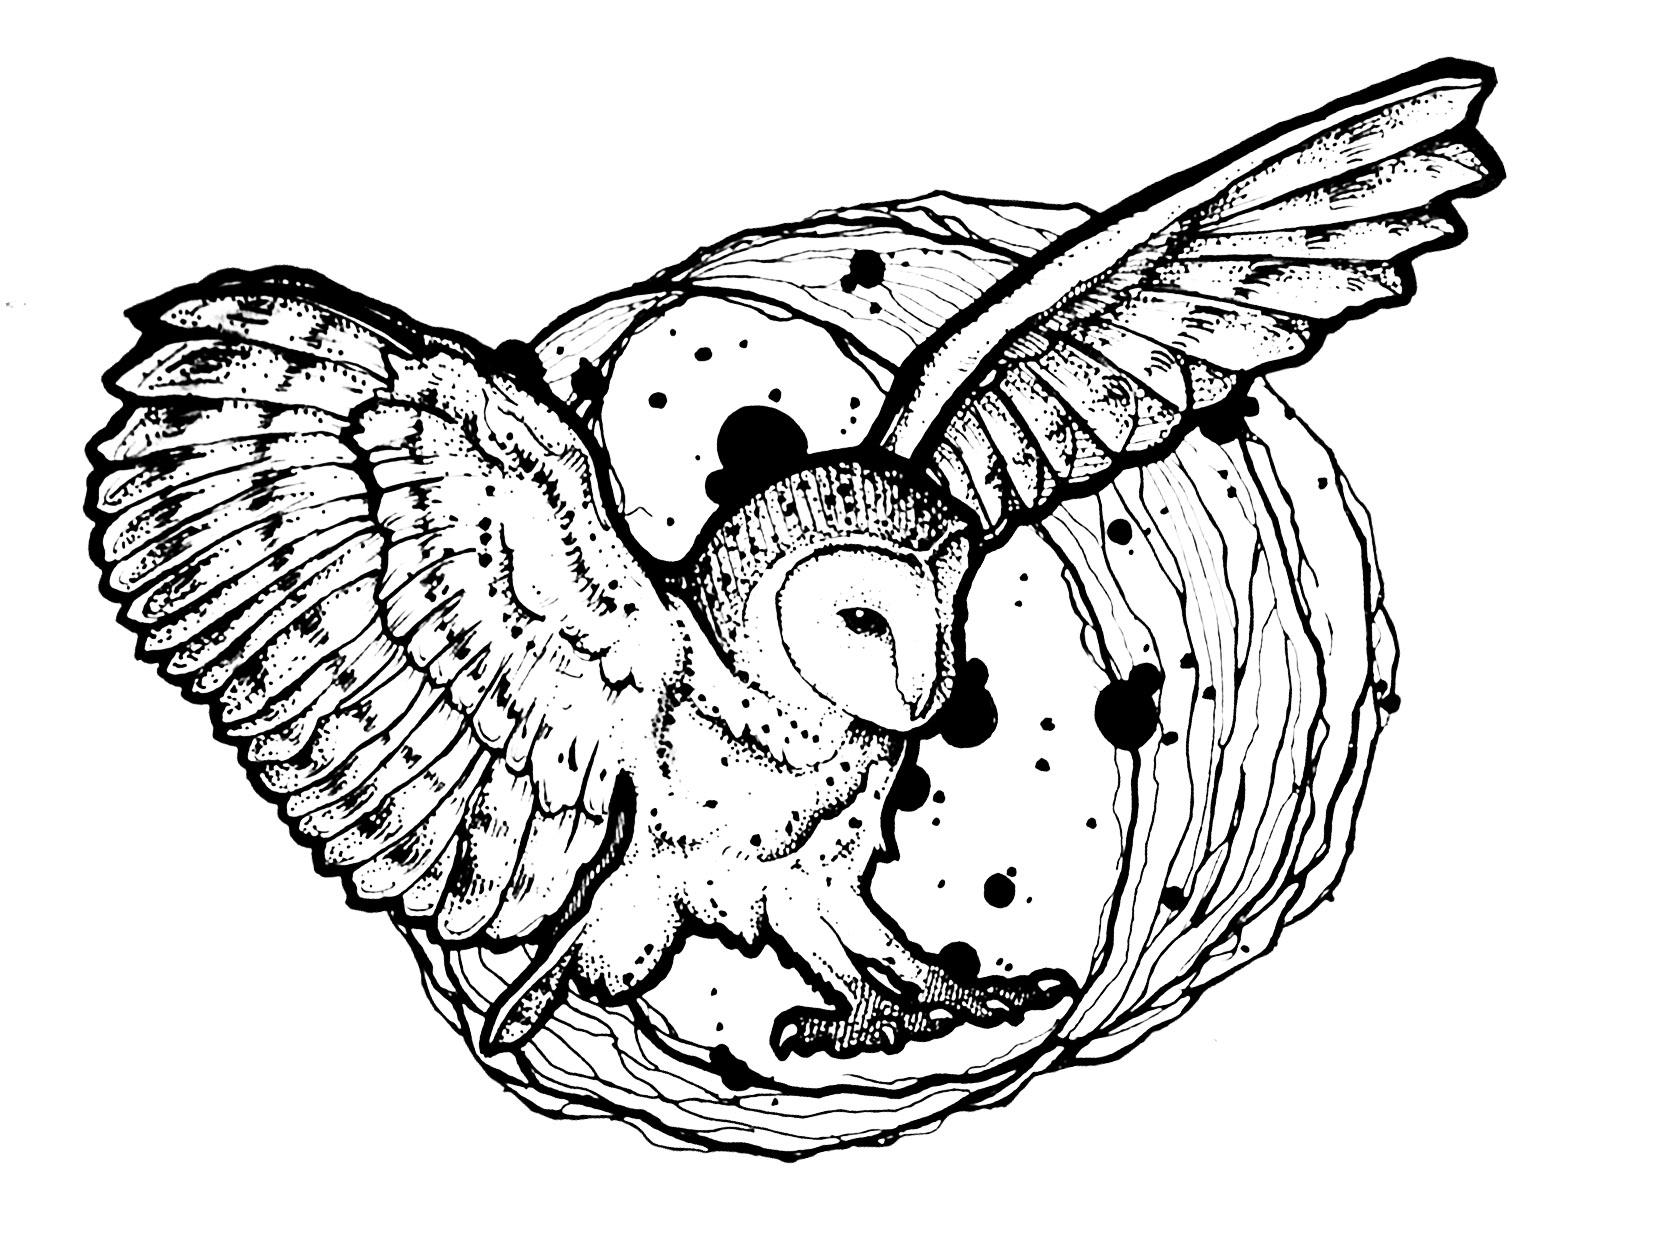 Hibou ailes deployees blog coloriages difficiles pour for Animali da colorare per adulti